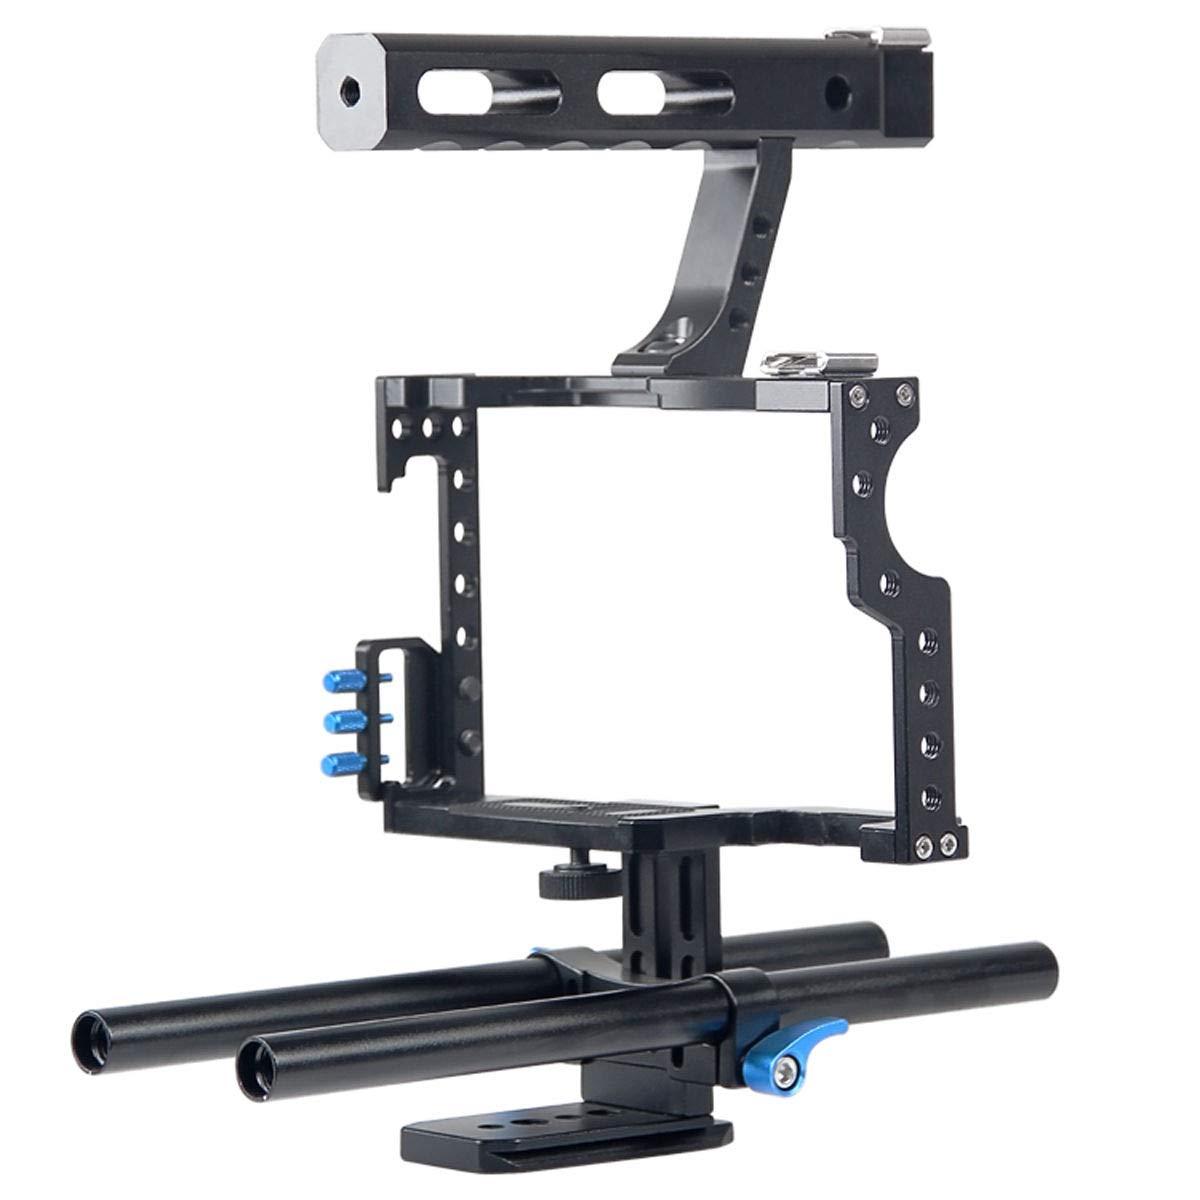 FidgetFidget Stabilizers for DSLR Camera Cage + Follow Focus + Matte Box Kit for Sony A7S A7 A7R A7RII A7SII by FidgetFidget (Image #7)